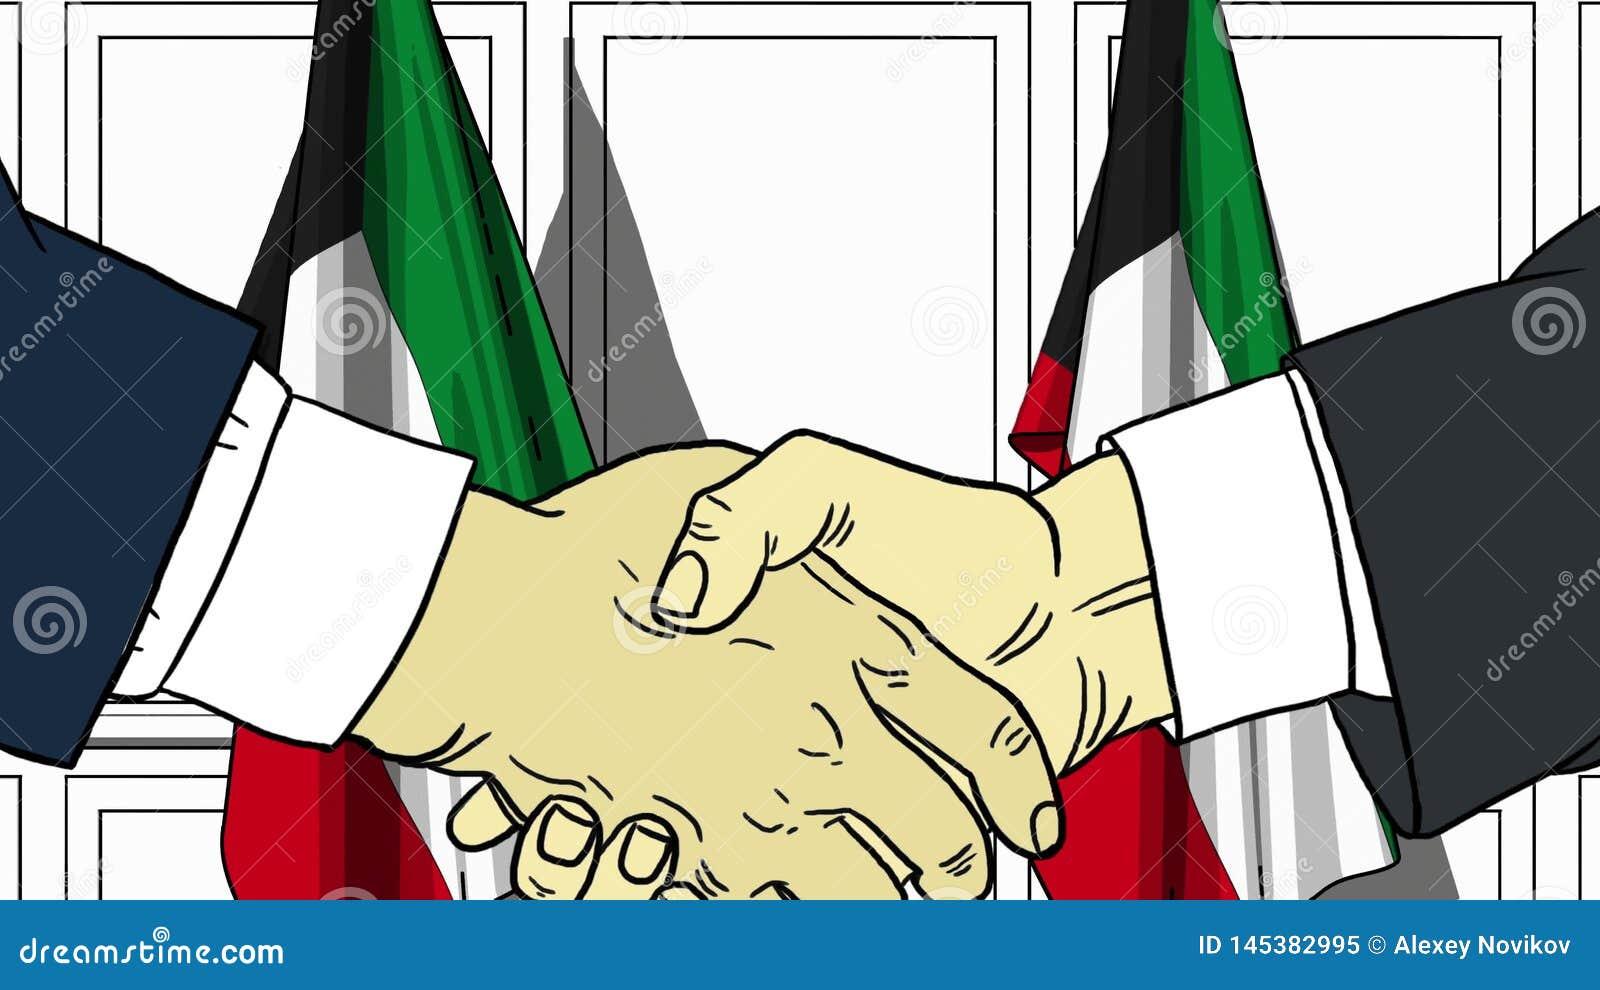 Aff?rsm?n eller politiker som skakar h?nder mot flaggor av Kuwait F?r m?te eller sl?kt tecknad filmillustration f?r samarbete